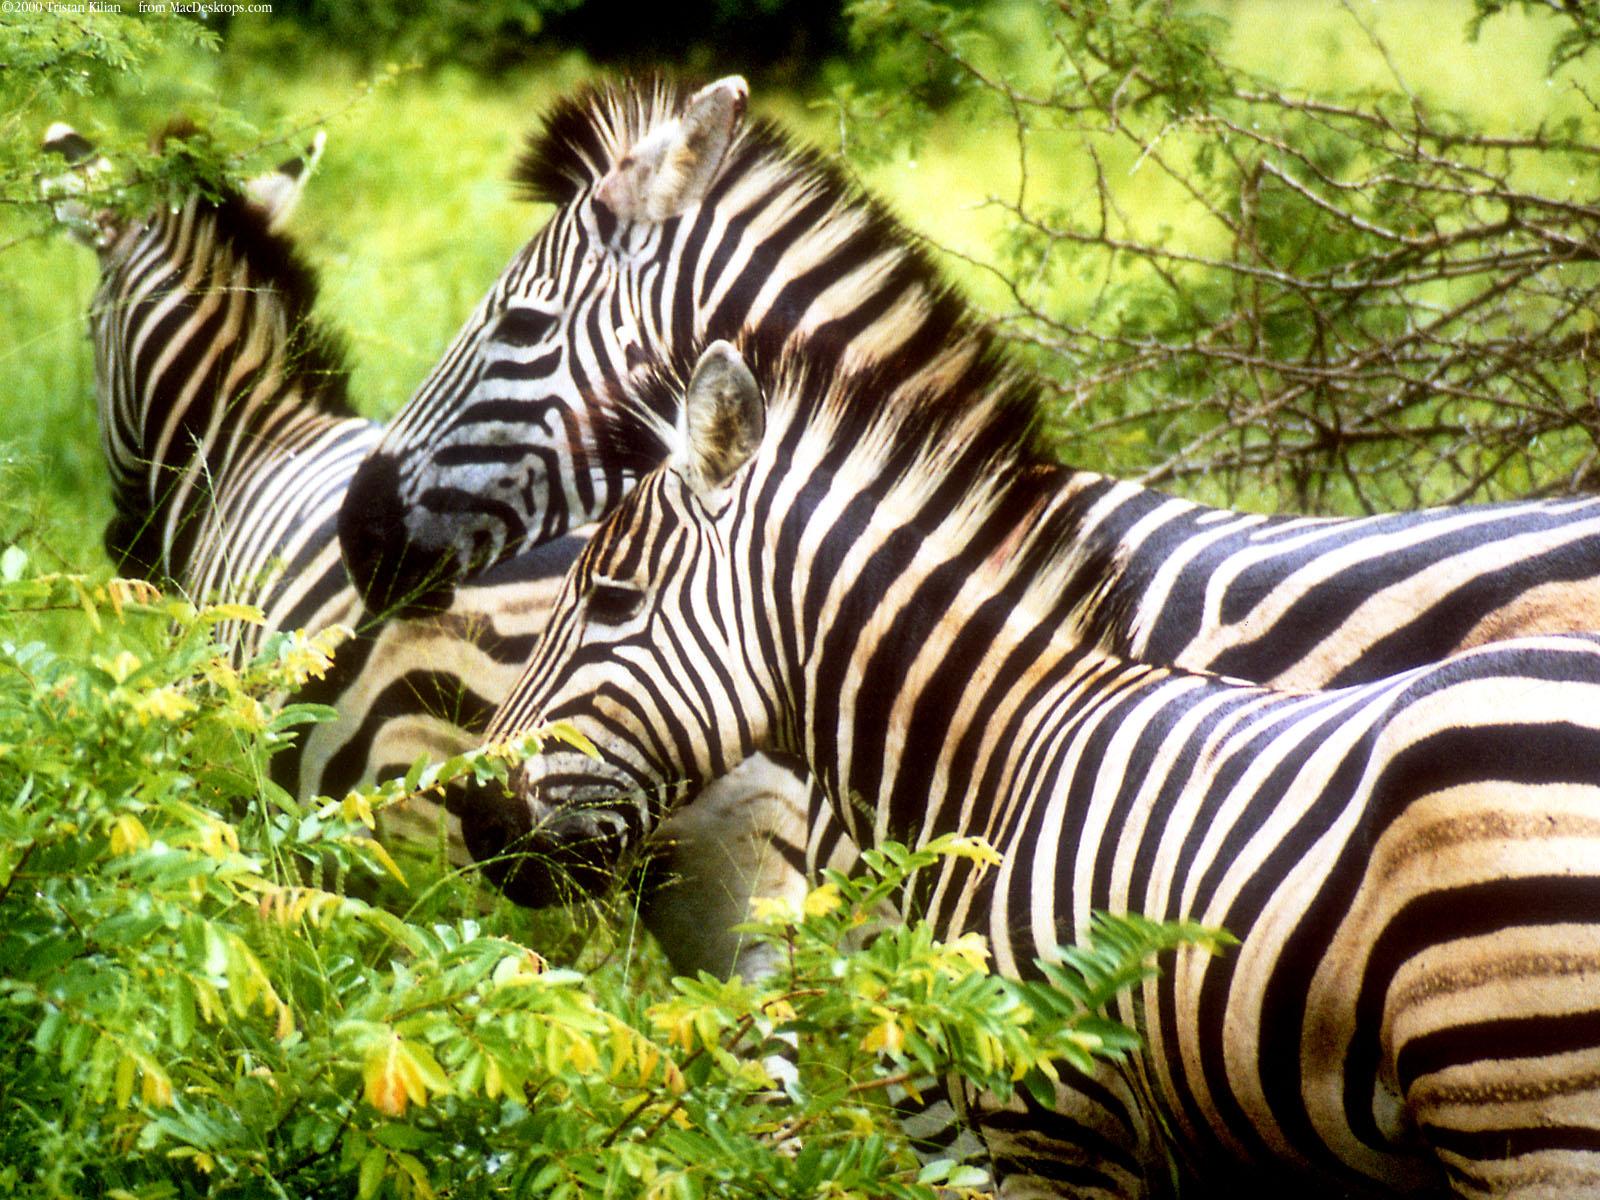 Zebras3833217420 - Zebras - Zebras, Butterfly